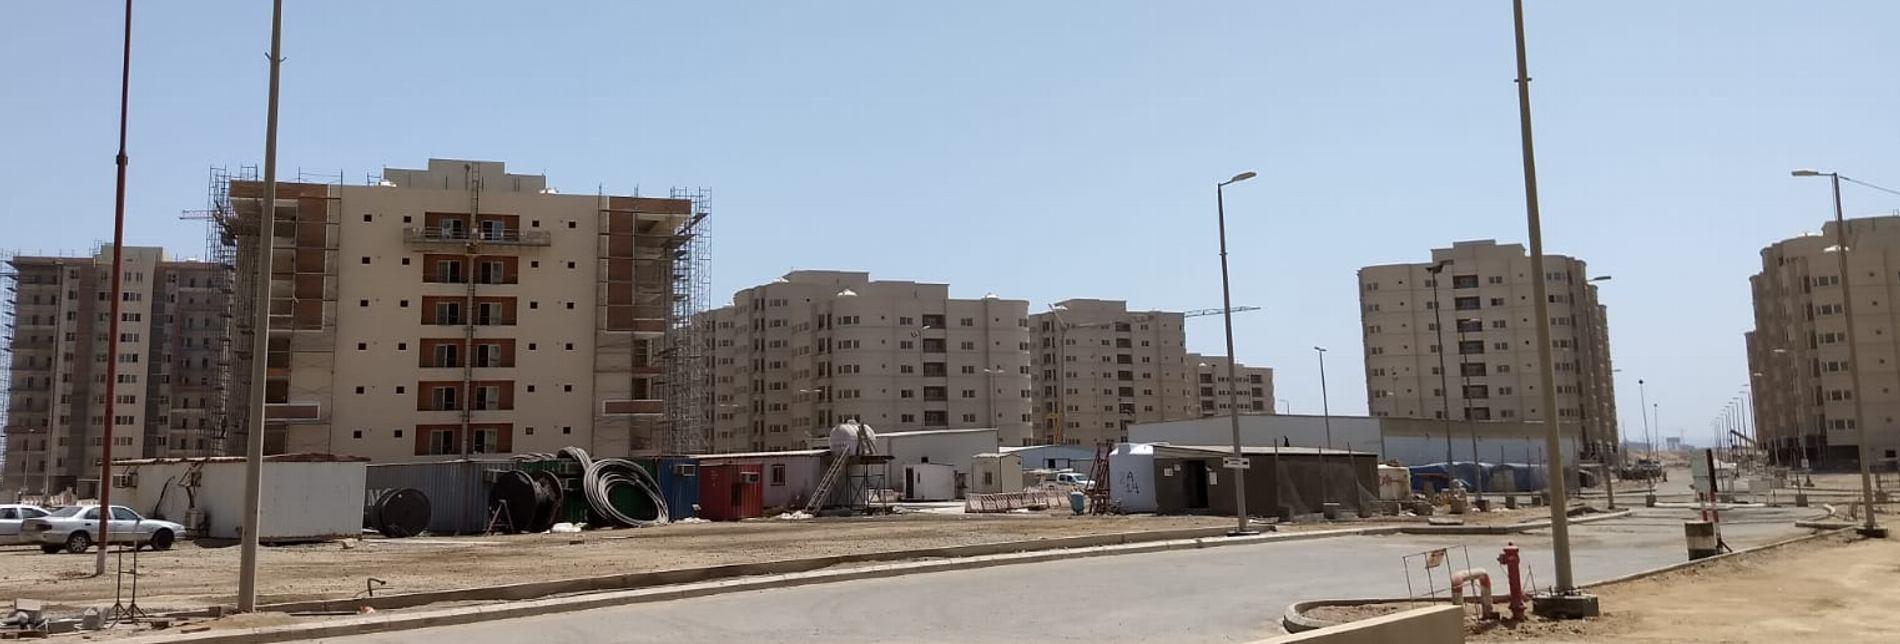 Asia Al Raidah Housing Complex Project Jeddah Arabia S